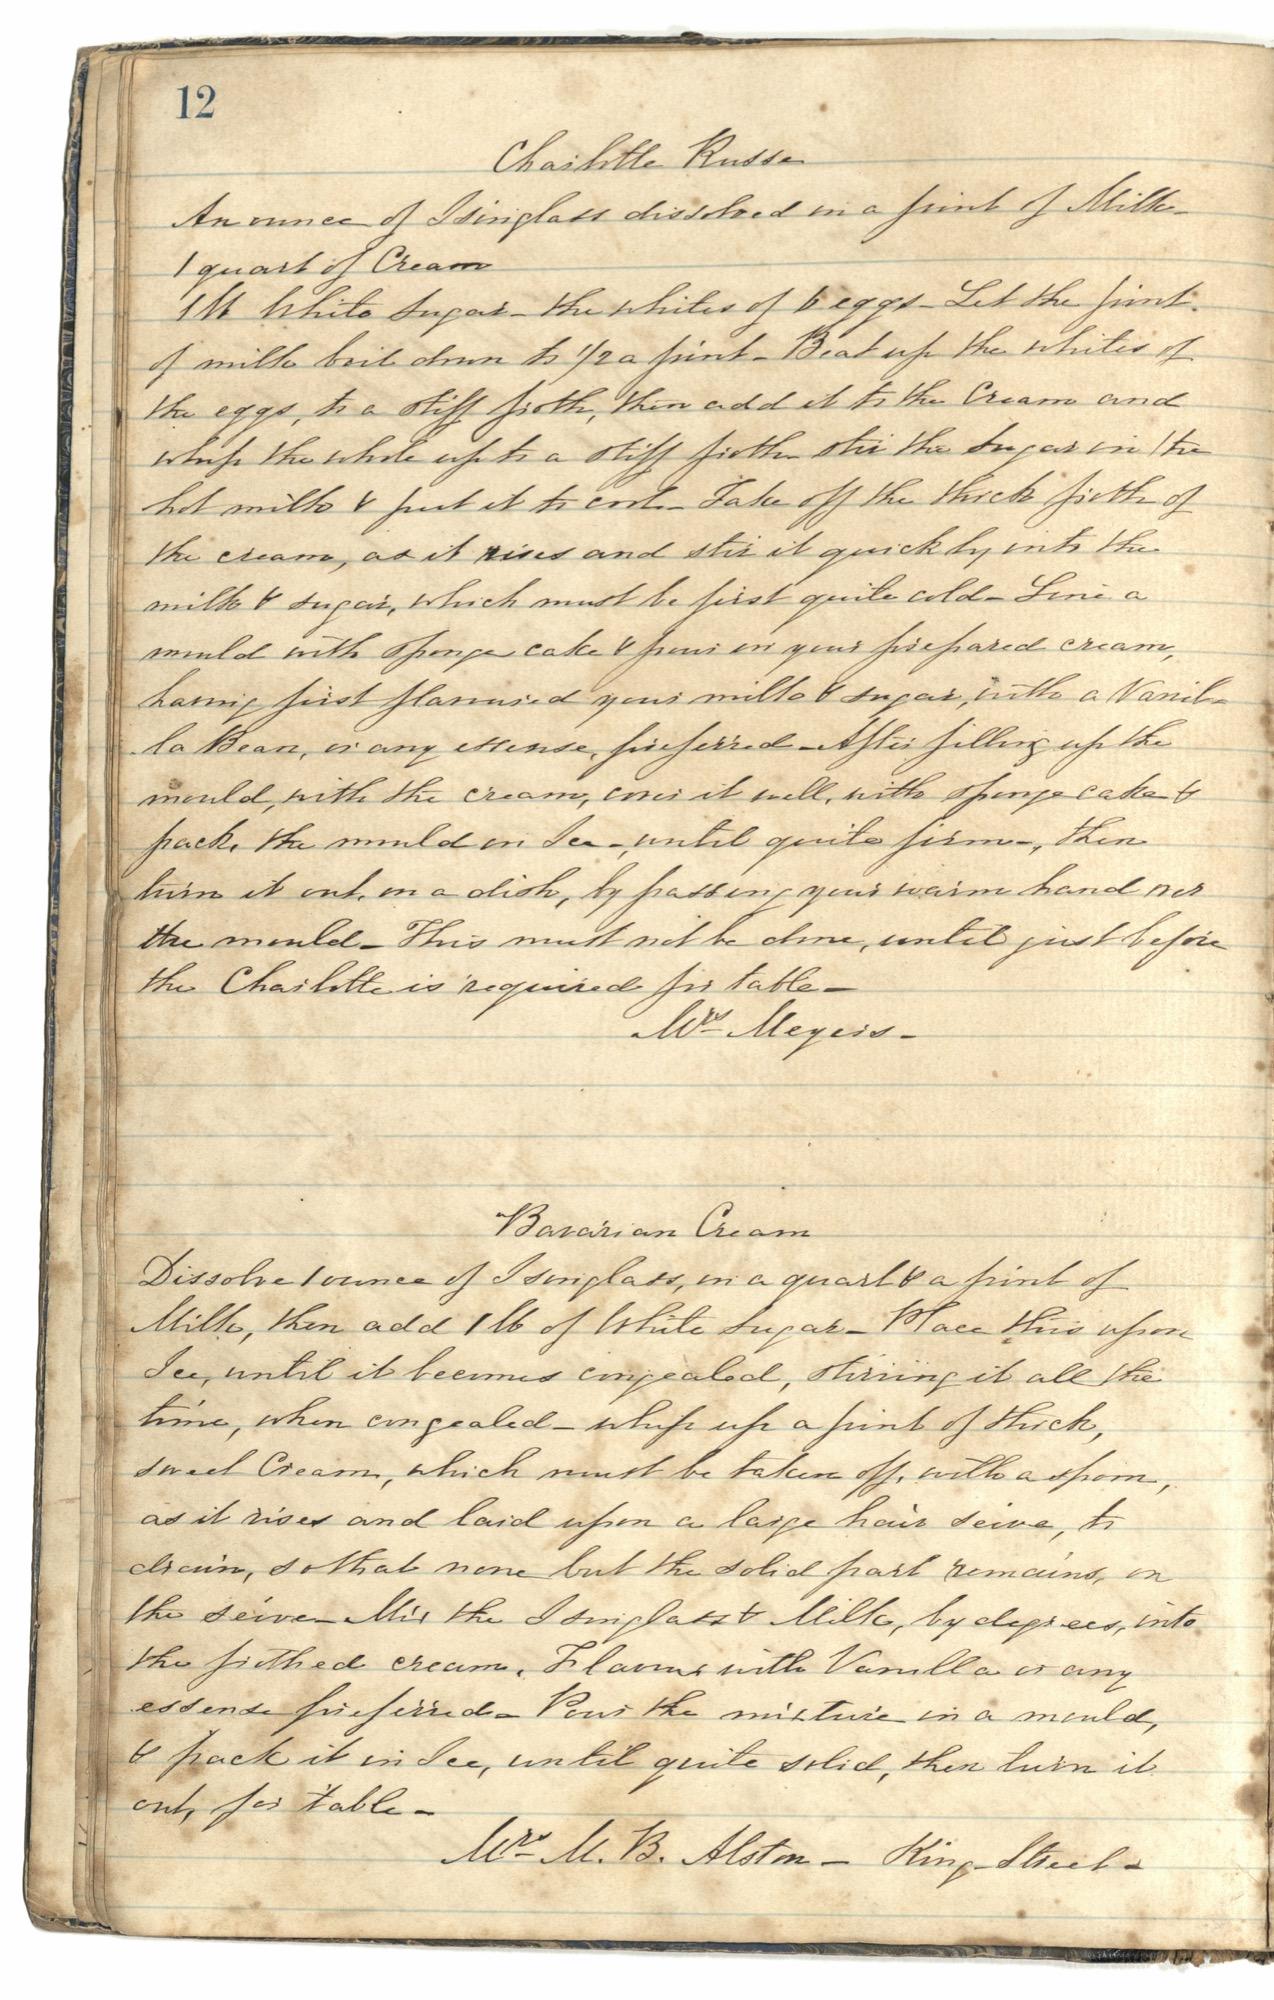 Mary Motte Alston Pringle Receipt Book, Page 16